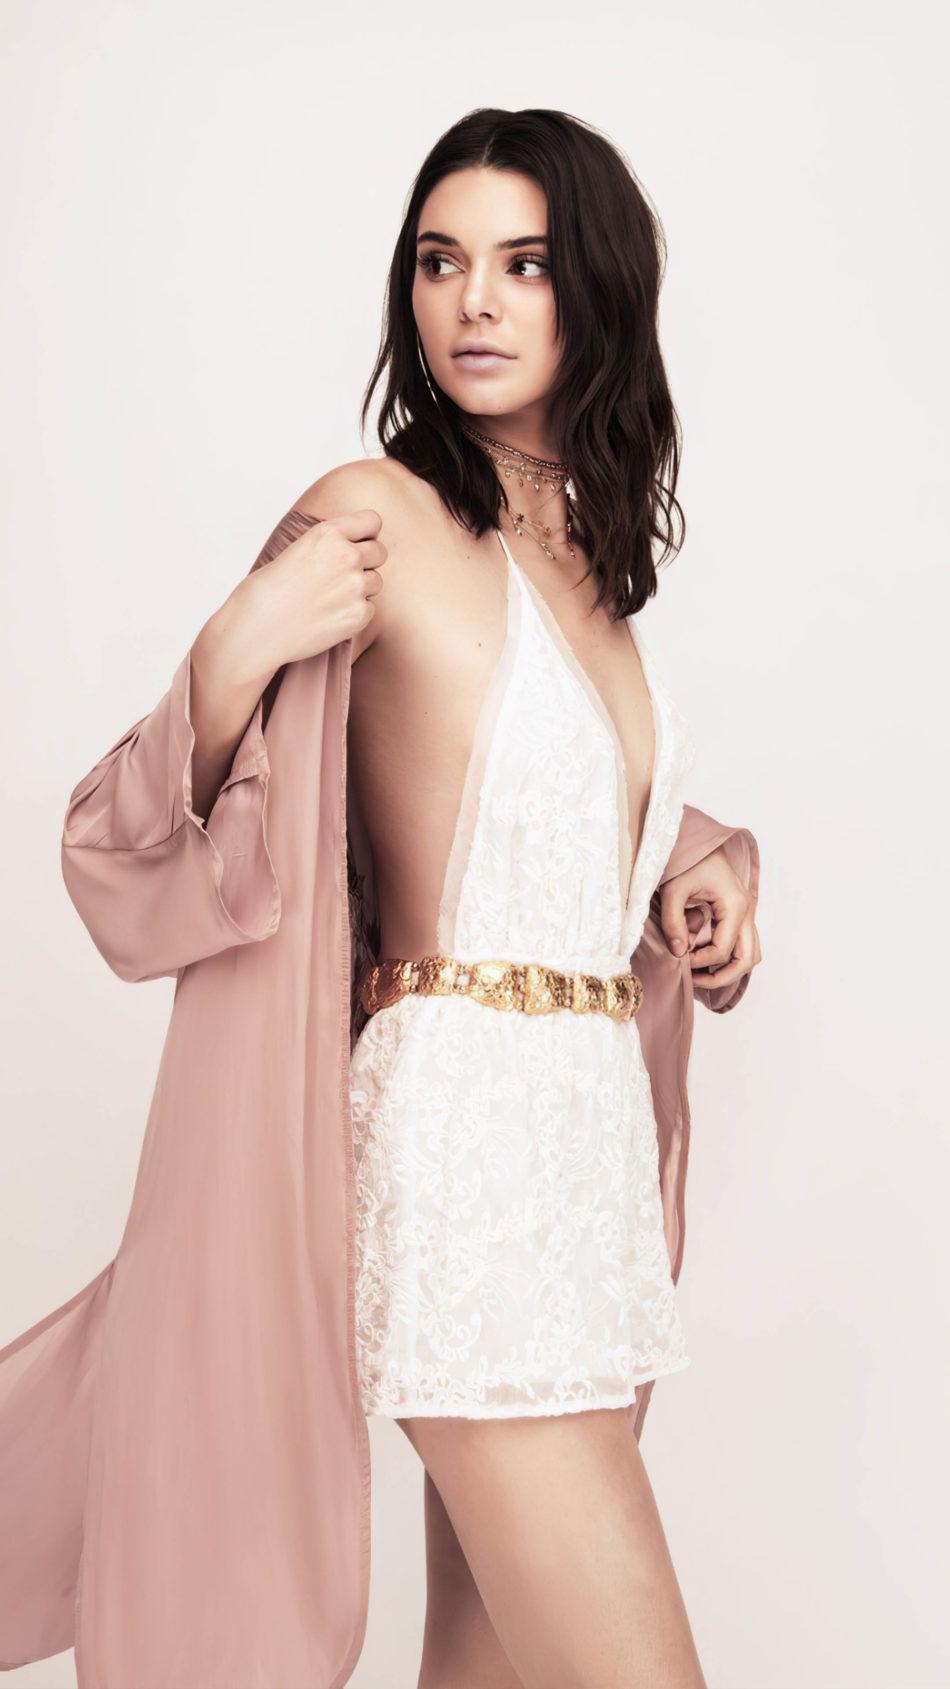 Kendall Jenner Fashion 2020 4K Ultra HD Mobile Wallpaper